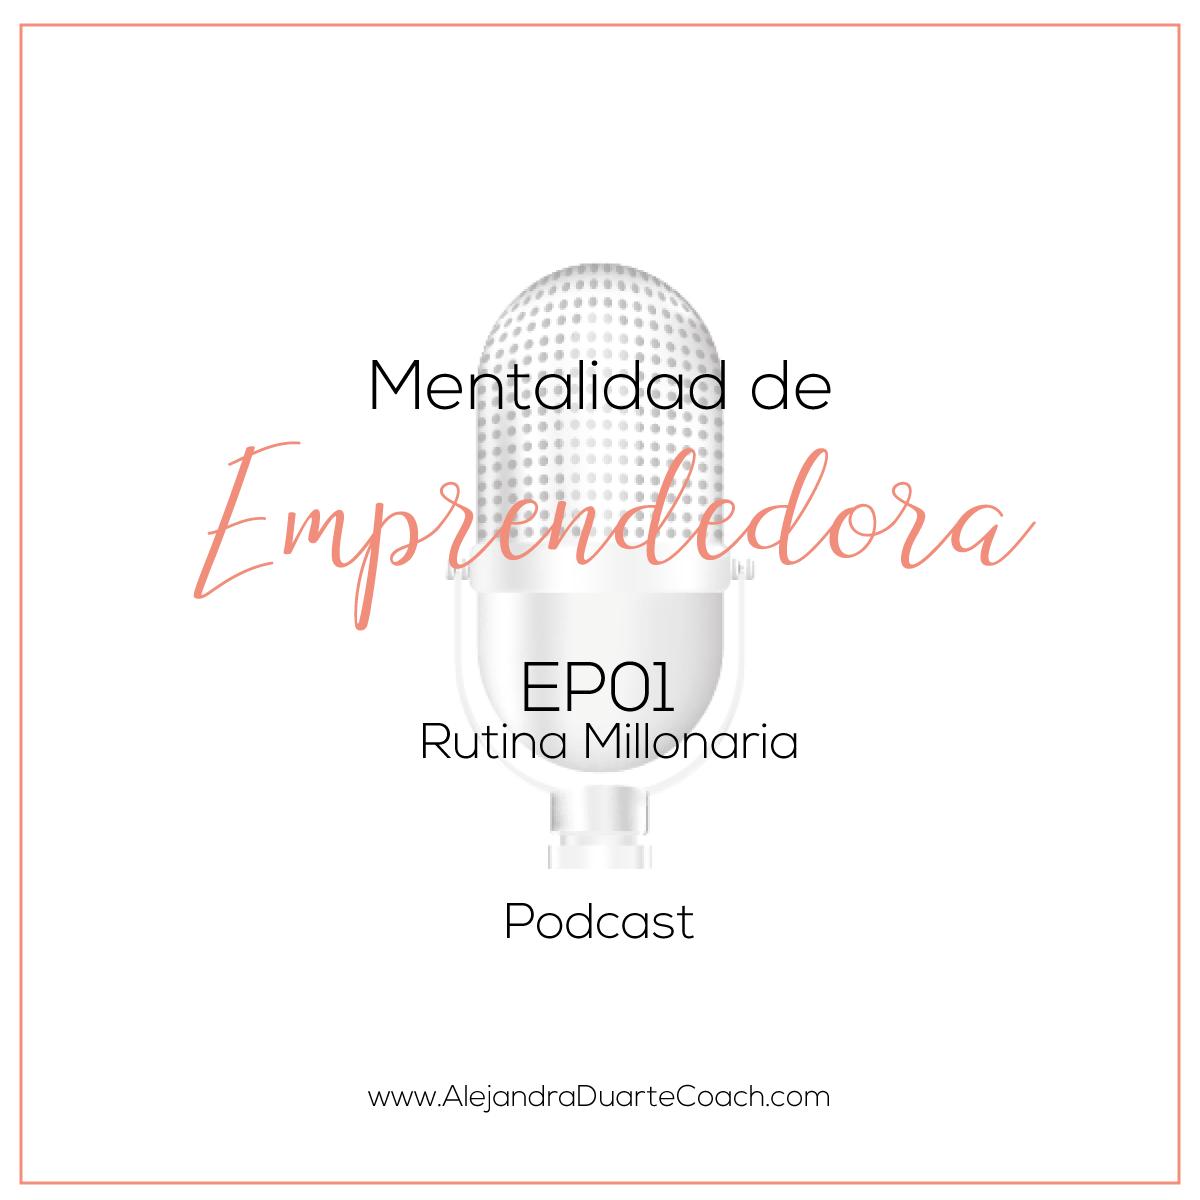 Mentalidad-de-emprendedora-EP1-Rutina-Millonaria